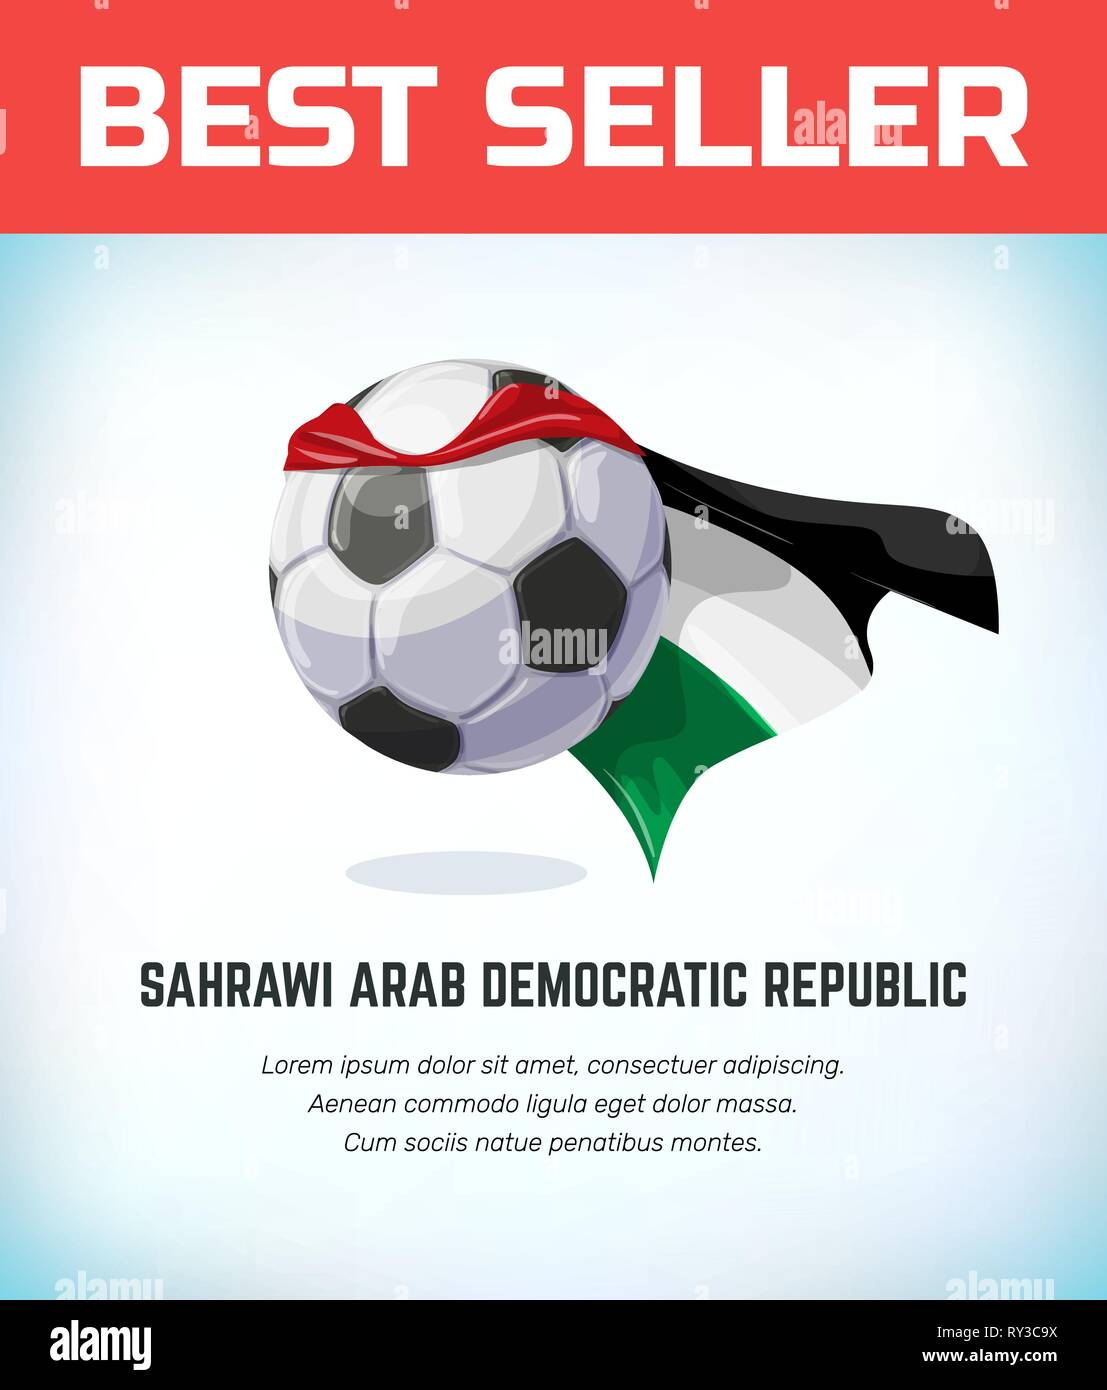 Sahrawi Arab Democratic Republic football or soccer ball. Football national team. Vector illustration. - Stock Image